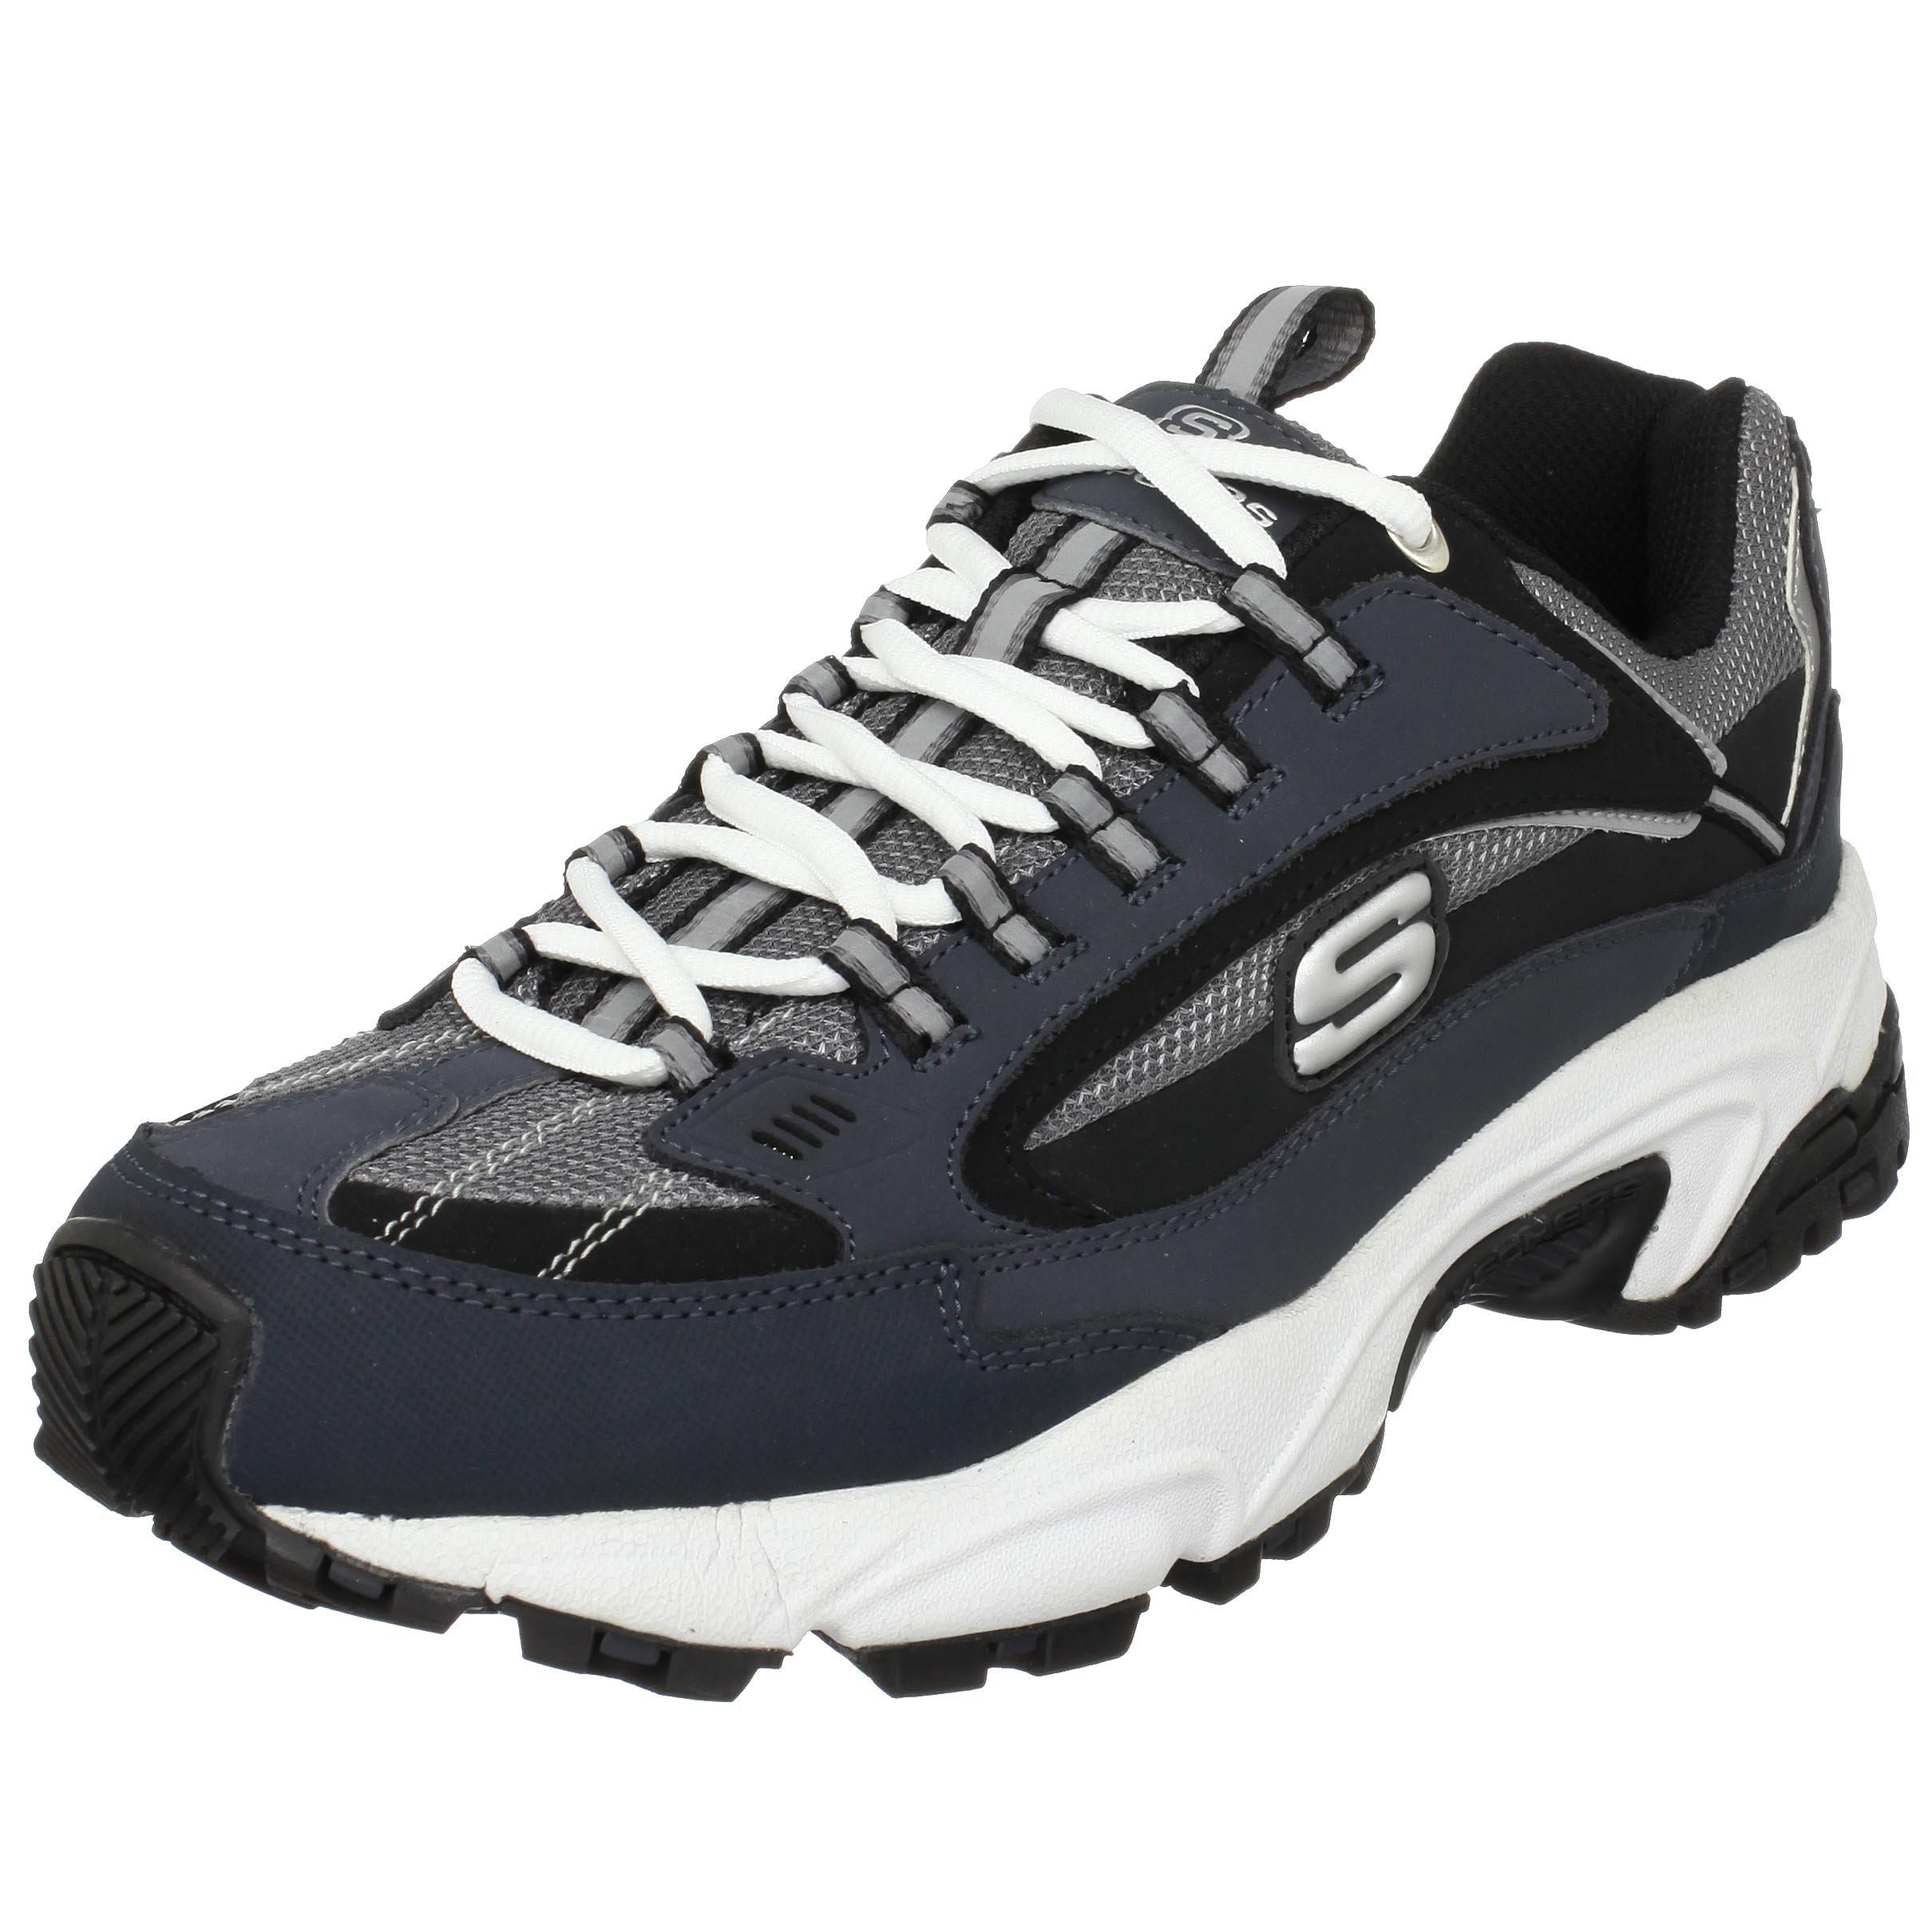 Skechers Sport Men's Stamina Nuovo Cutback Lace Up Sneaker,NavyBlack,10.5 M US